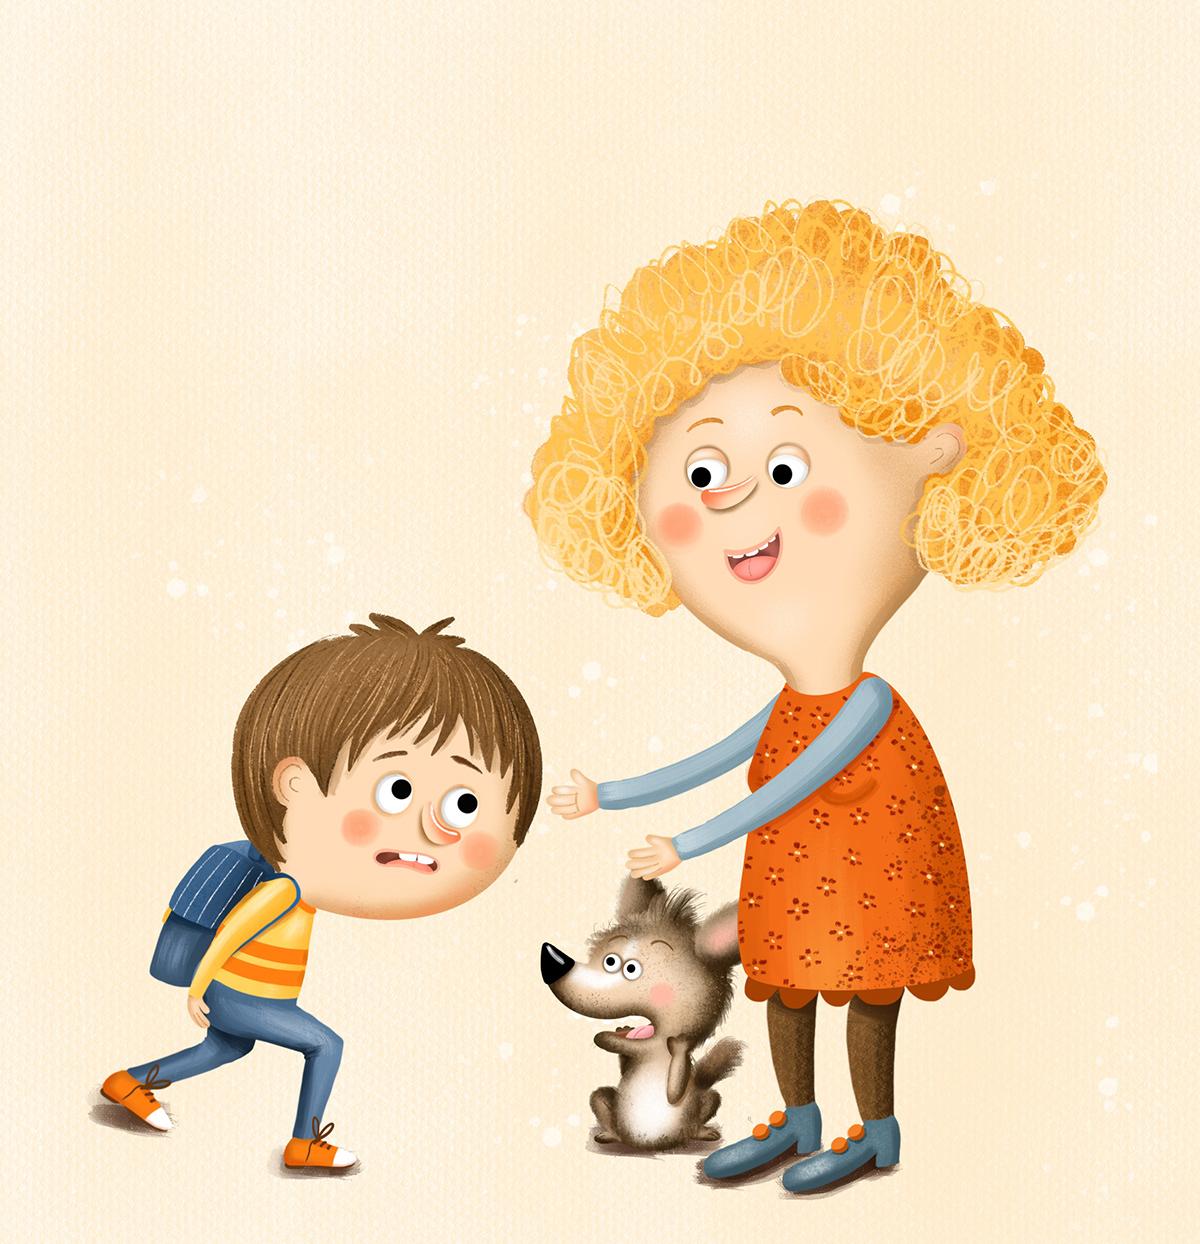 boy children childrenbook ChildrenIllustration digitalart dog Education mother school